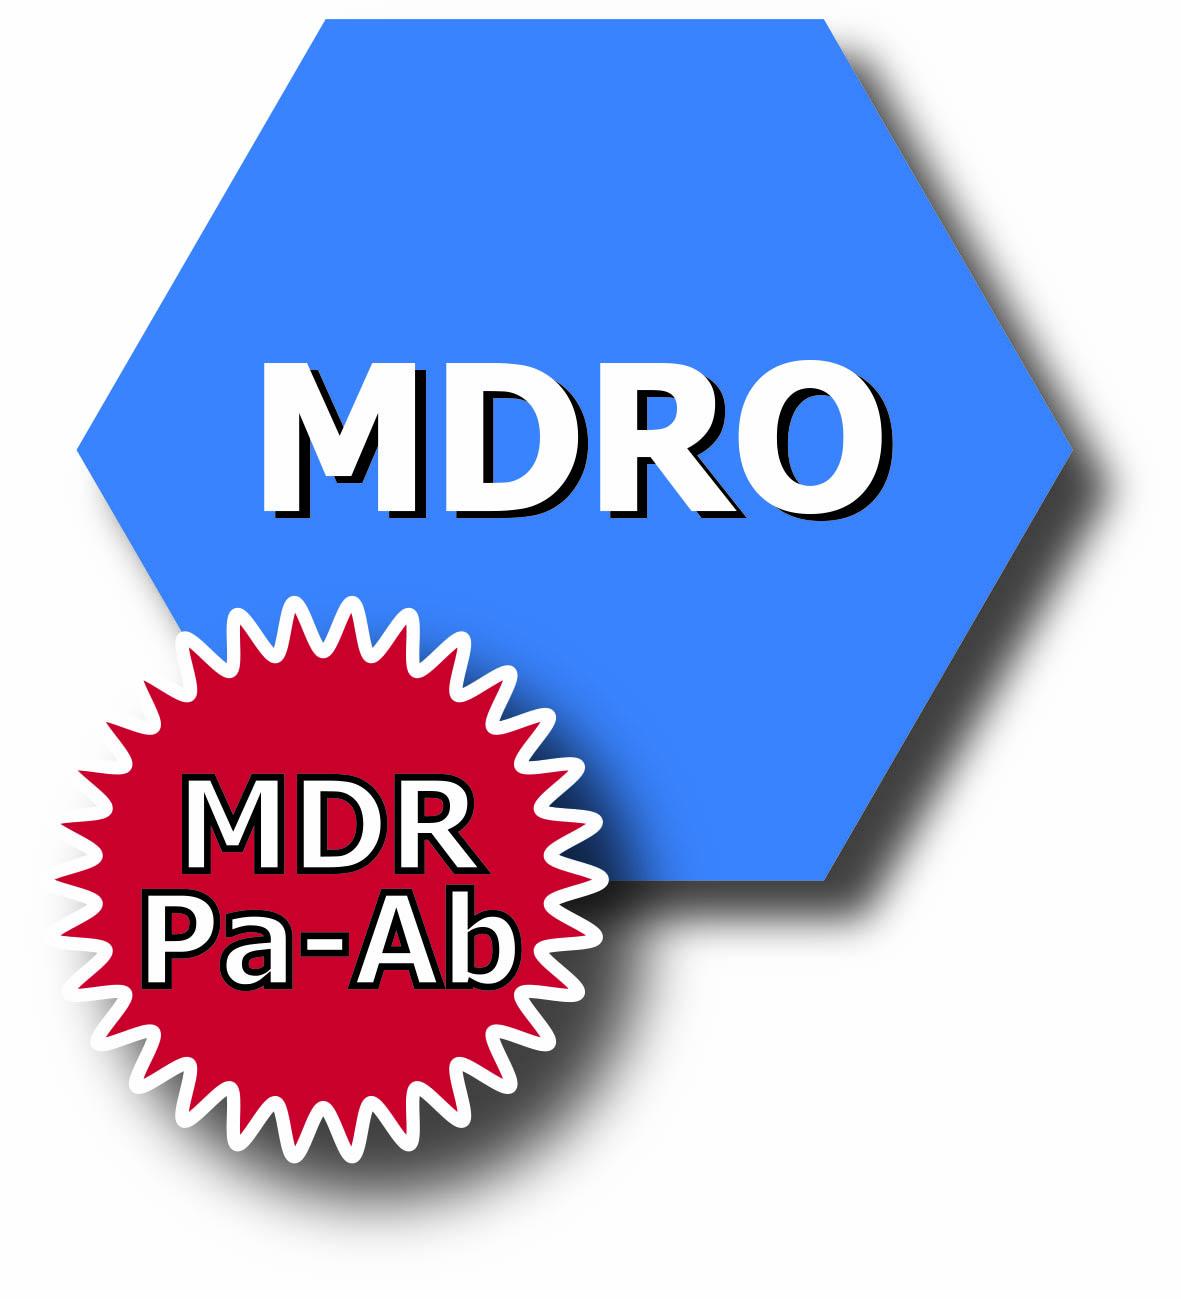 MDR Pa-Ab